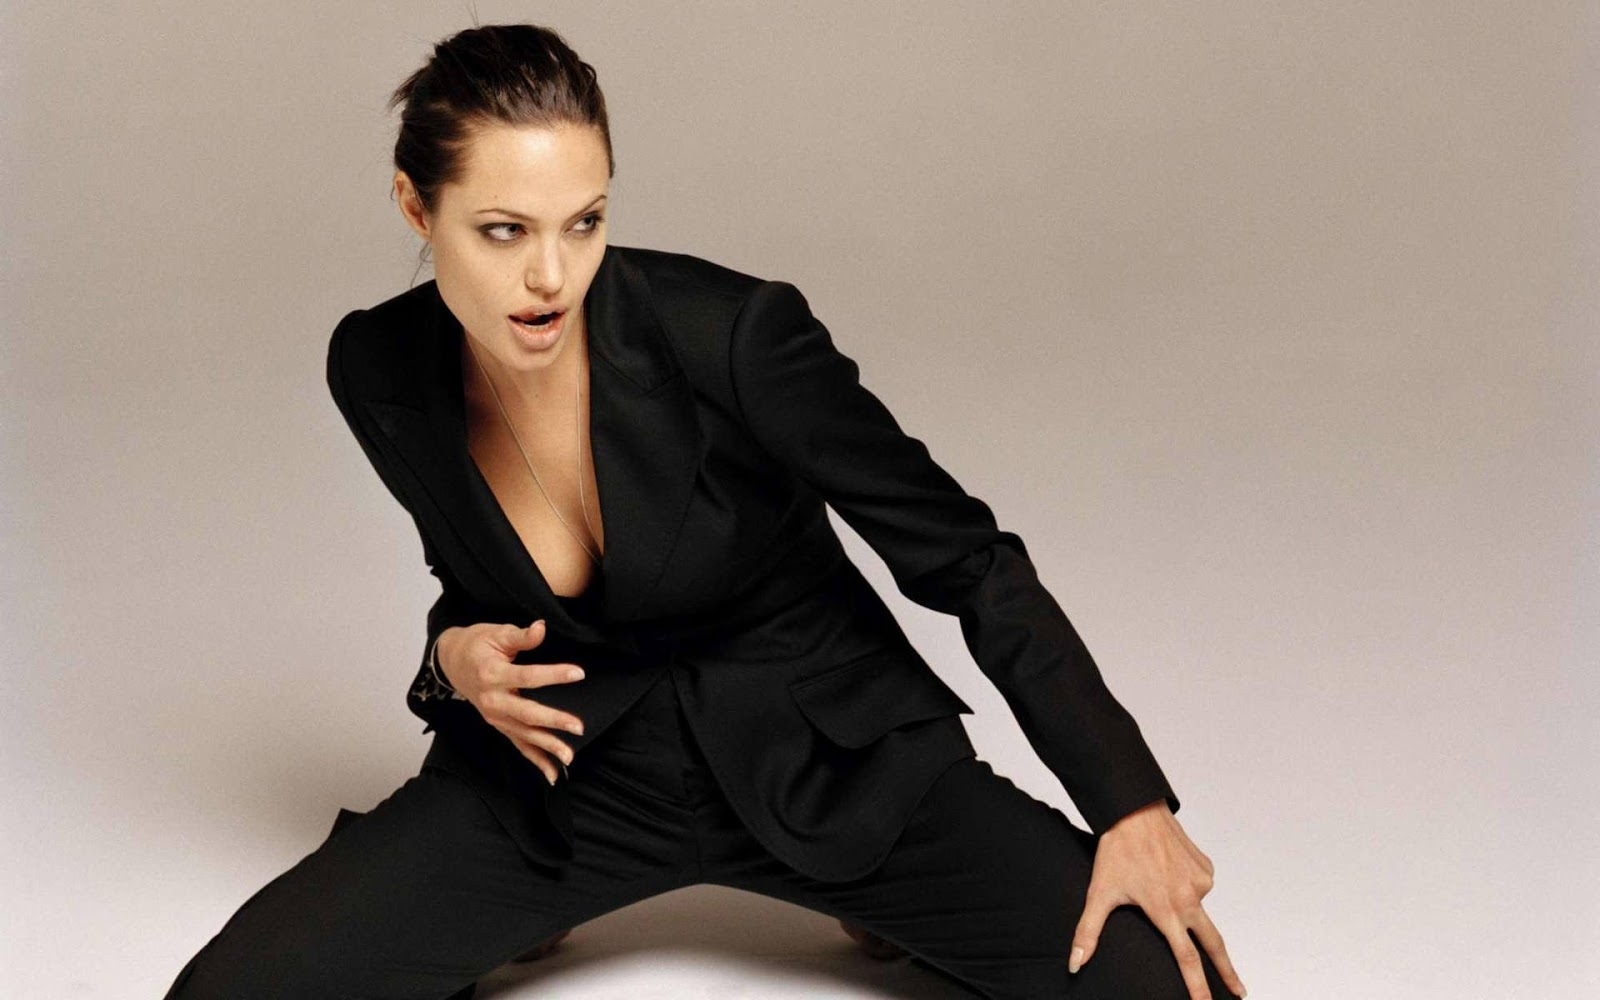 http://4.bp.blogspot.com/-PK9B3A4vWzA/TniNaLk8e8I/AAAAAAAACX8/U2jeSAe_byo/s1600/Angelina_Jolie_3.jpg